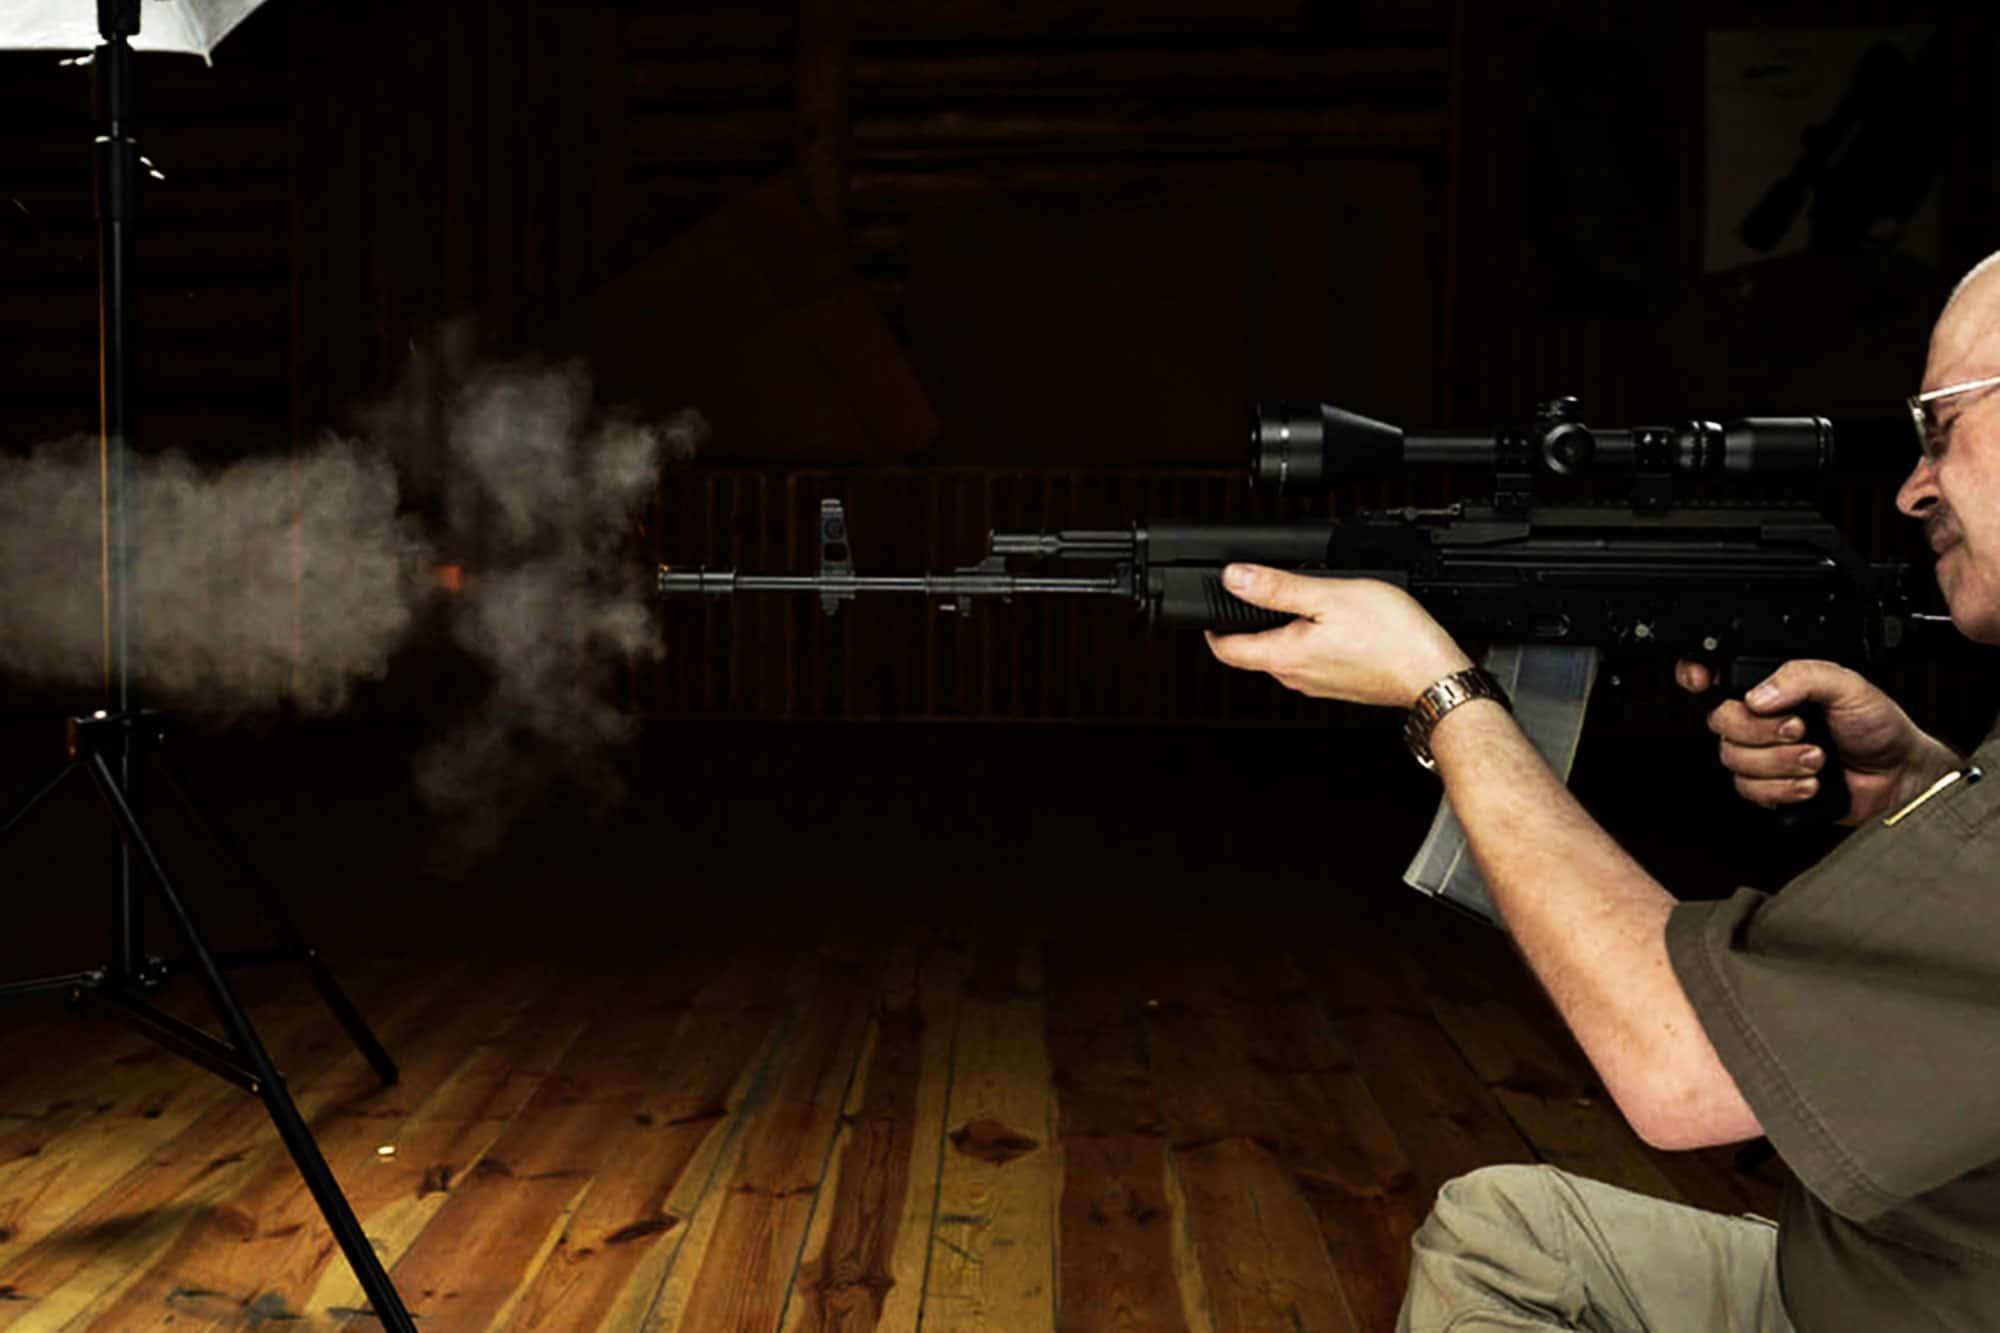 Man shoots a Kalashnikov gun during activity in warsaw